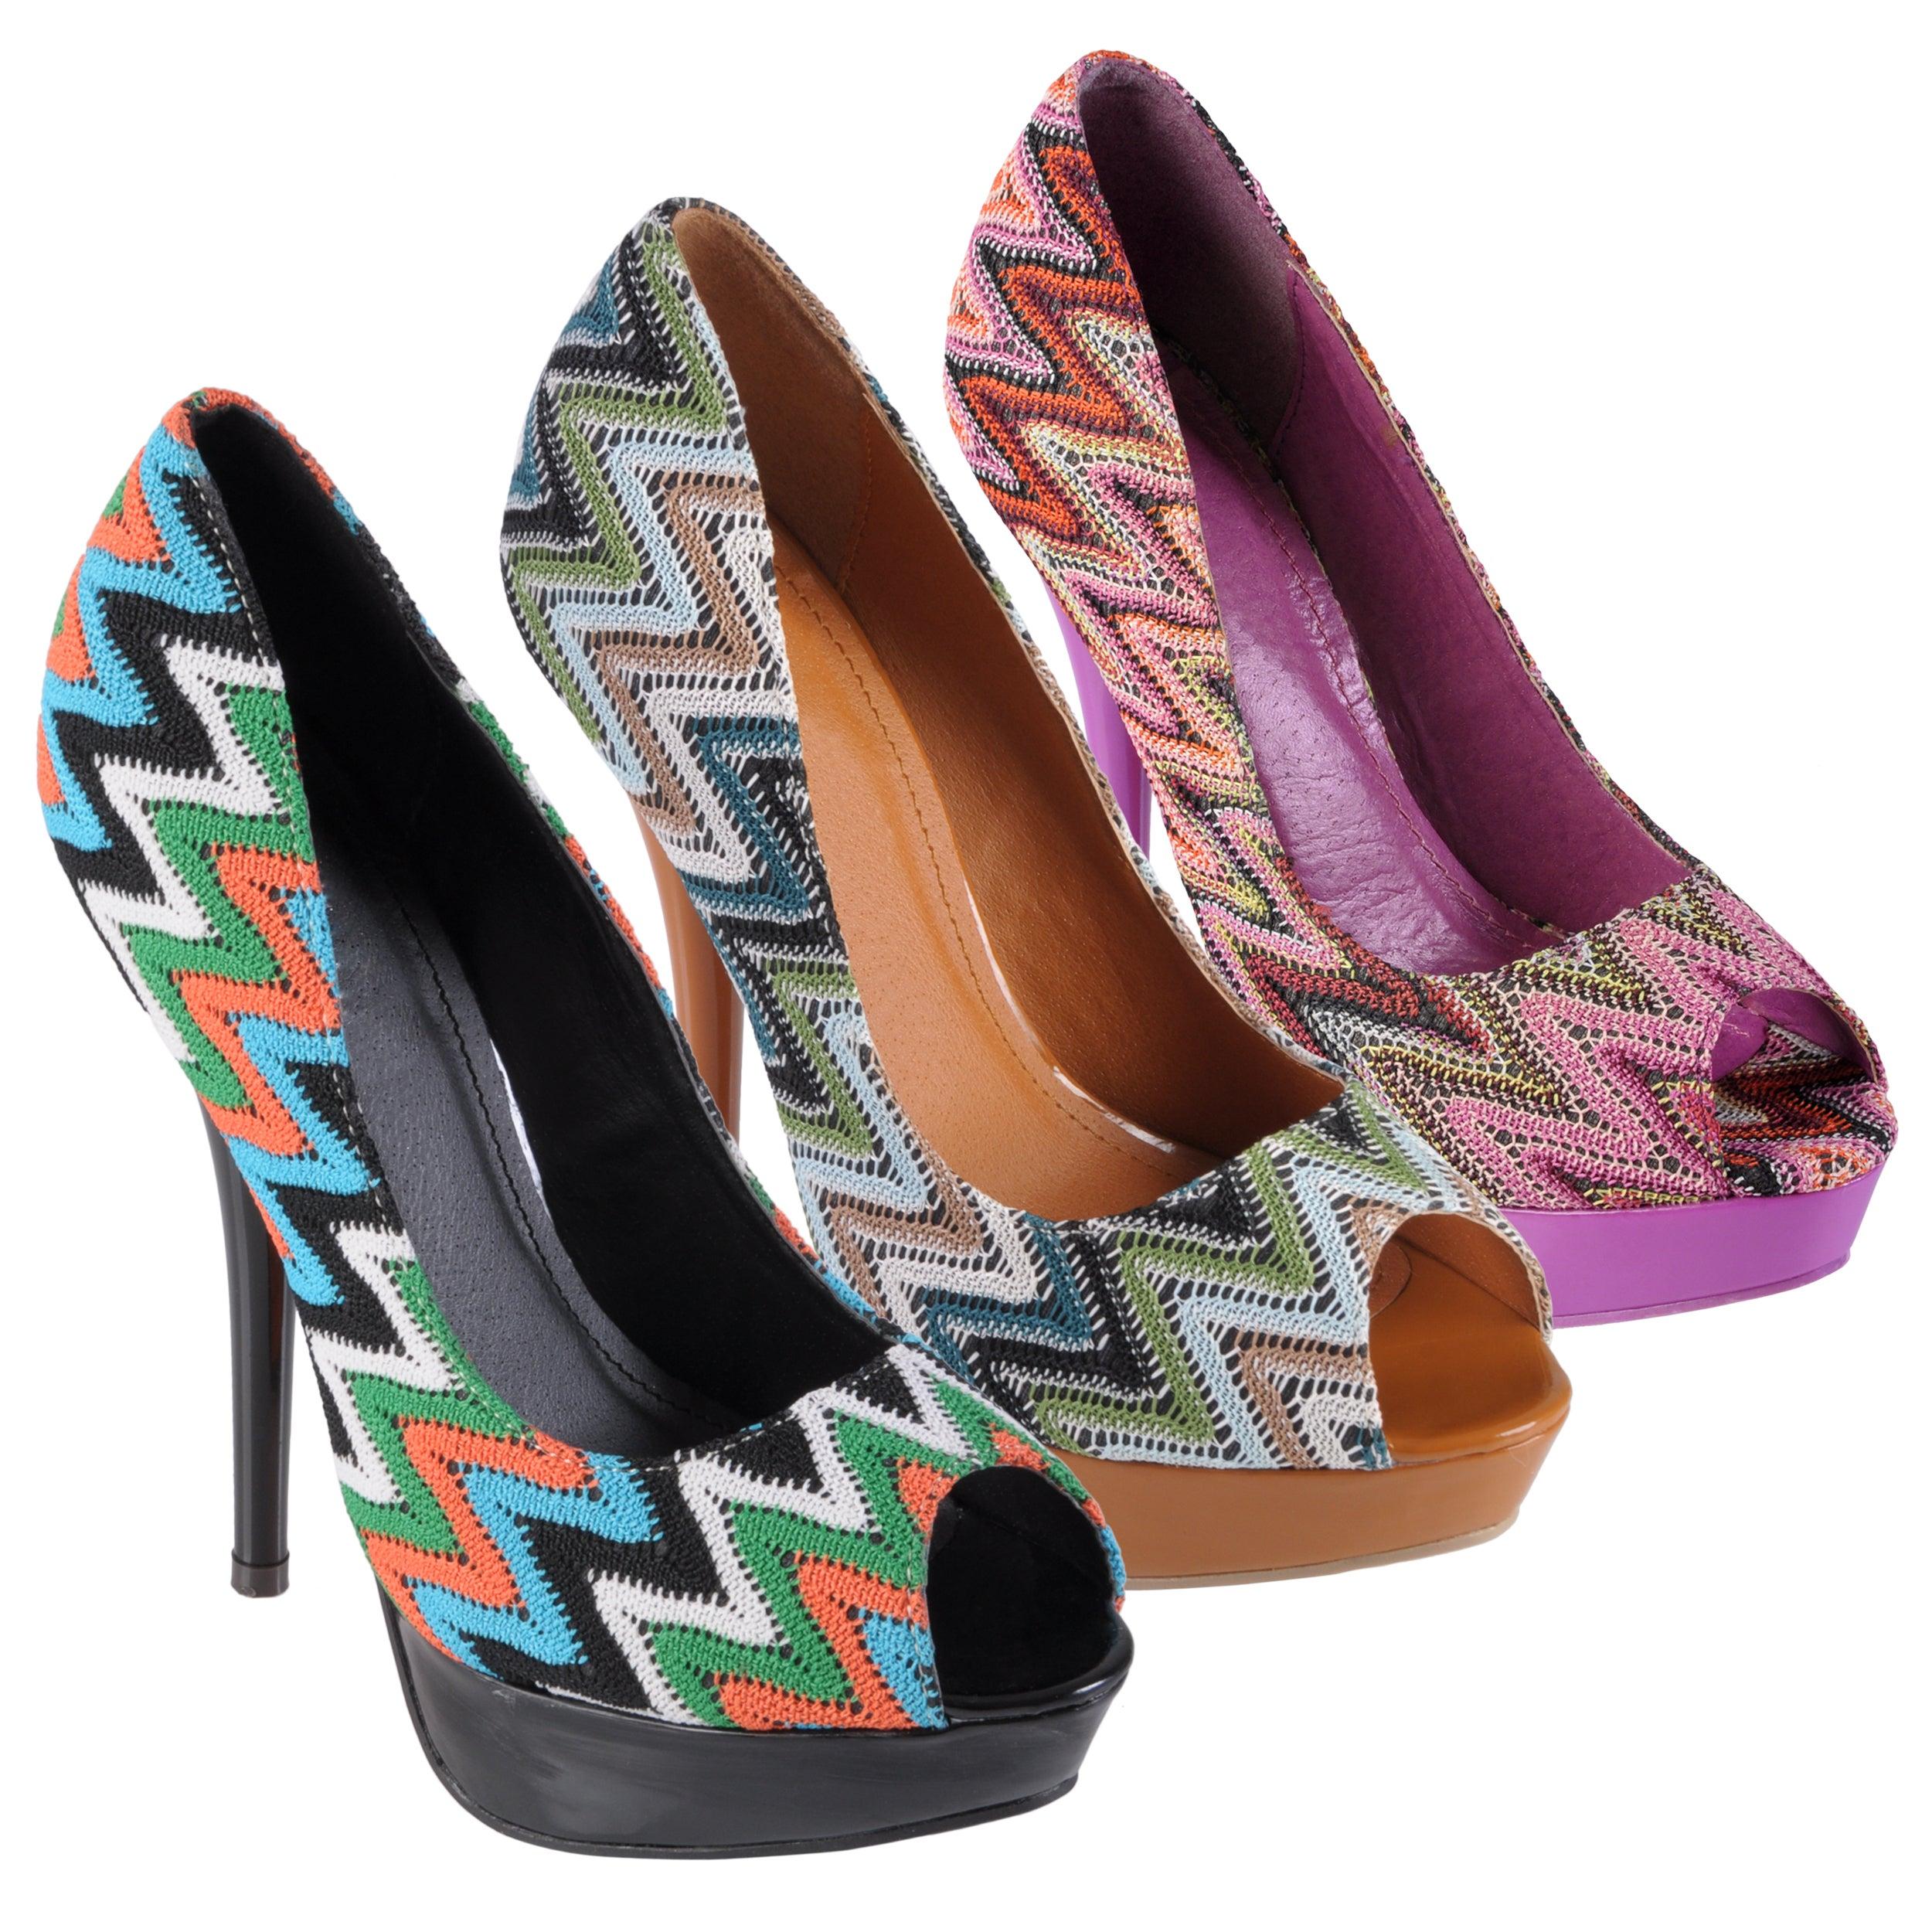 Hailey Jeans Co Women's 'Lamb-33' Open Toe Platform Stilettos